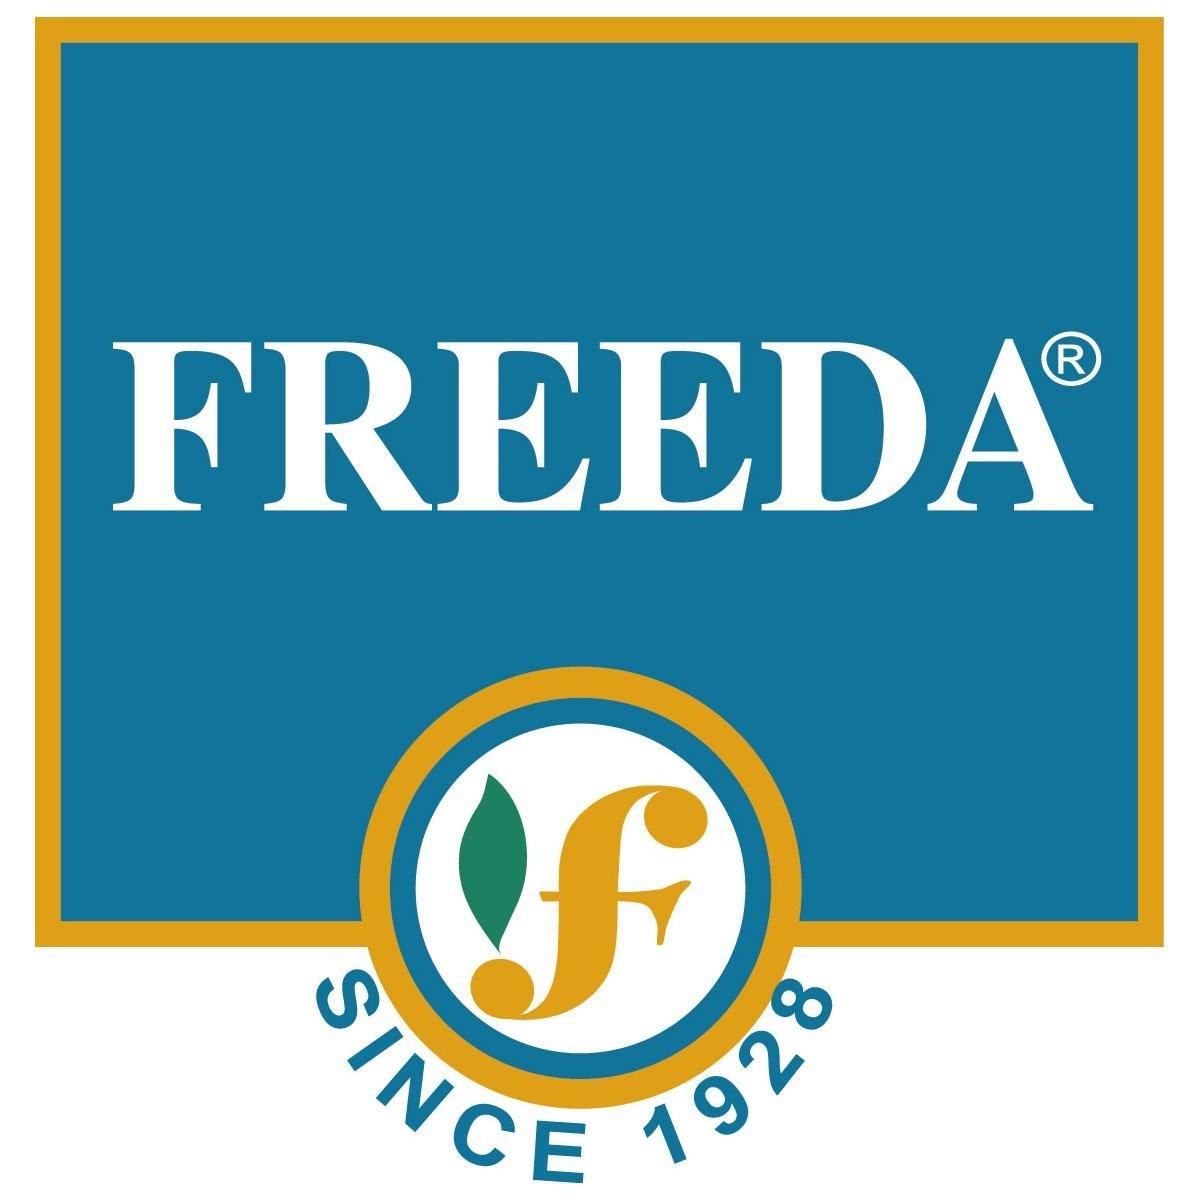 Freeda Logo